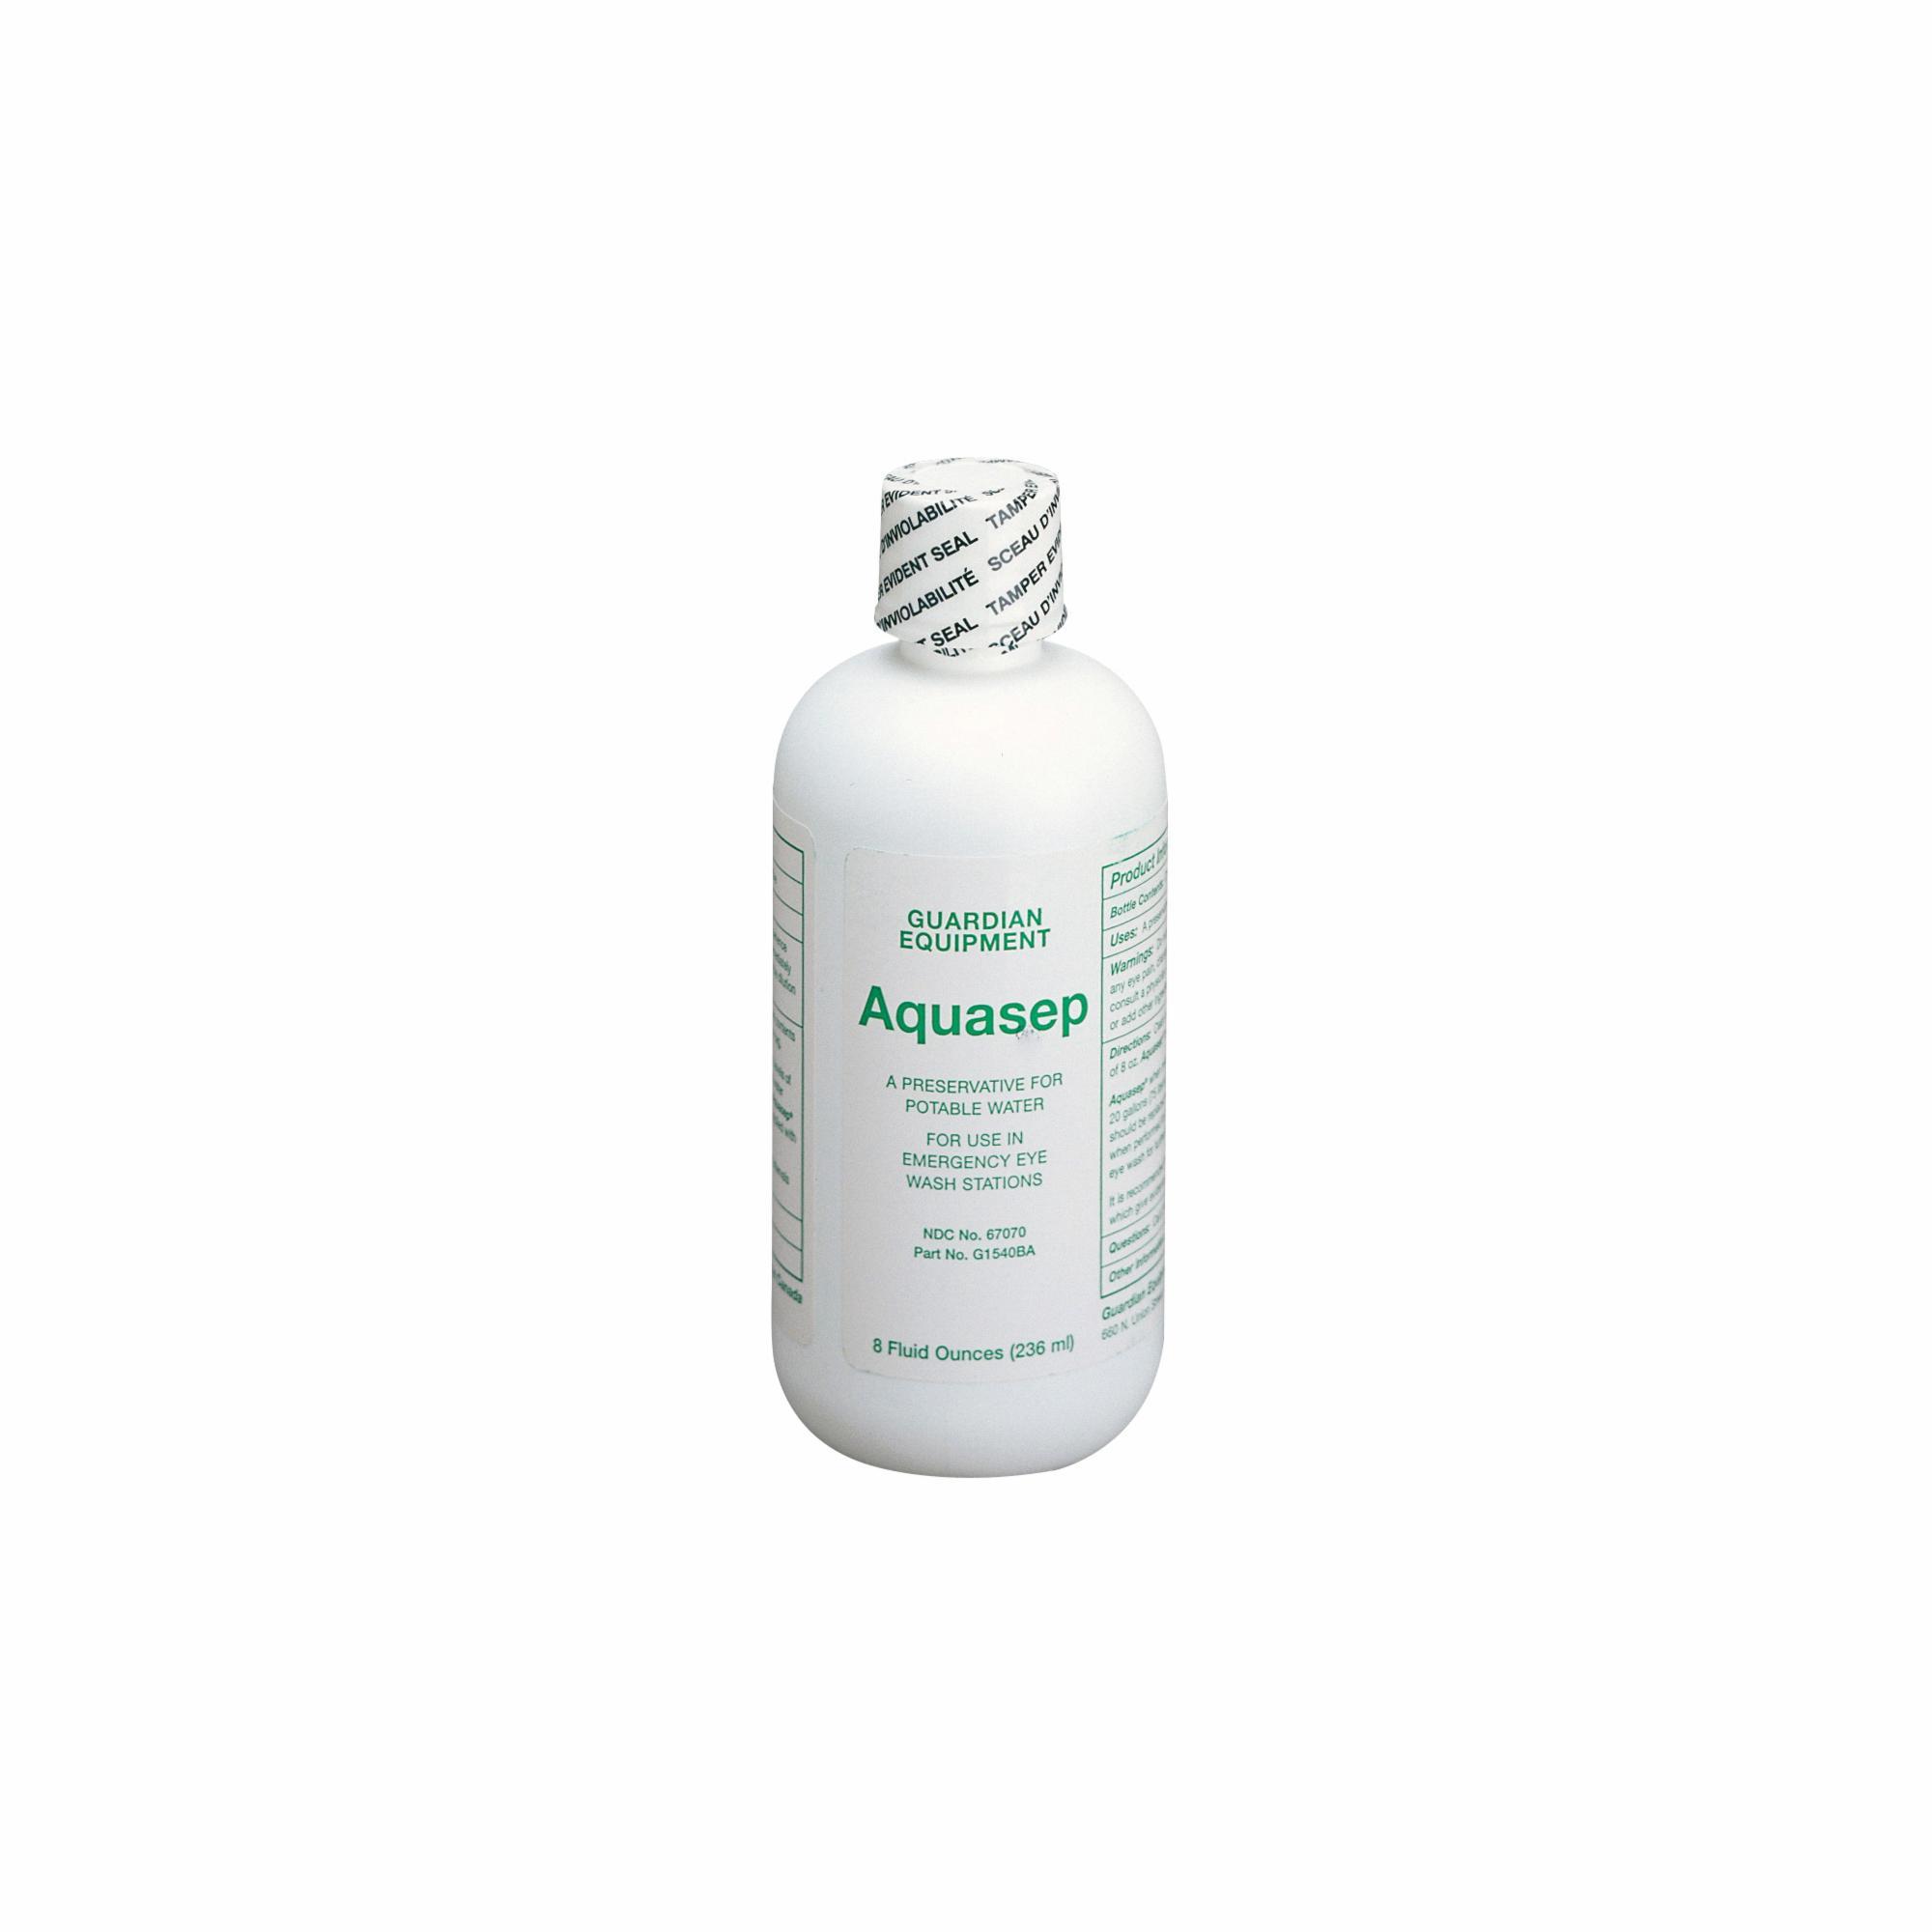 Guardian AquaGuard™ G1540BA Bacteriostatic Additive, 8 oz Bottle, For Use With Model G1540 16 gal Gravity-Flow Portable Eyewash